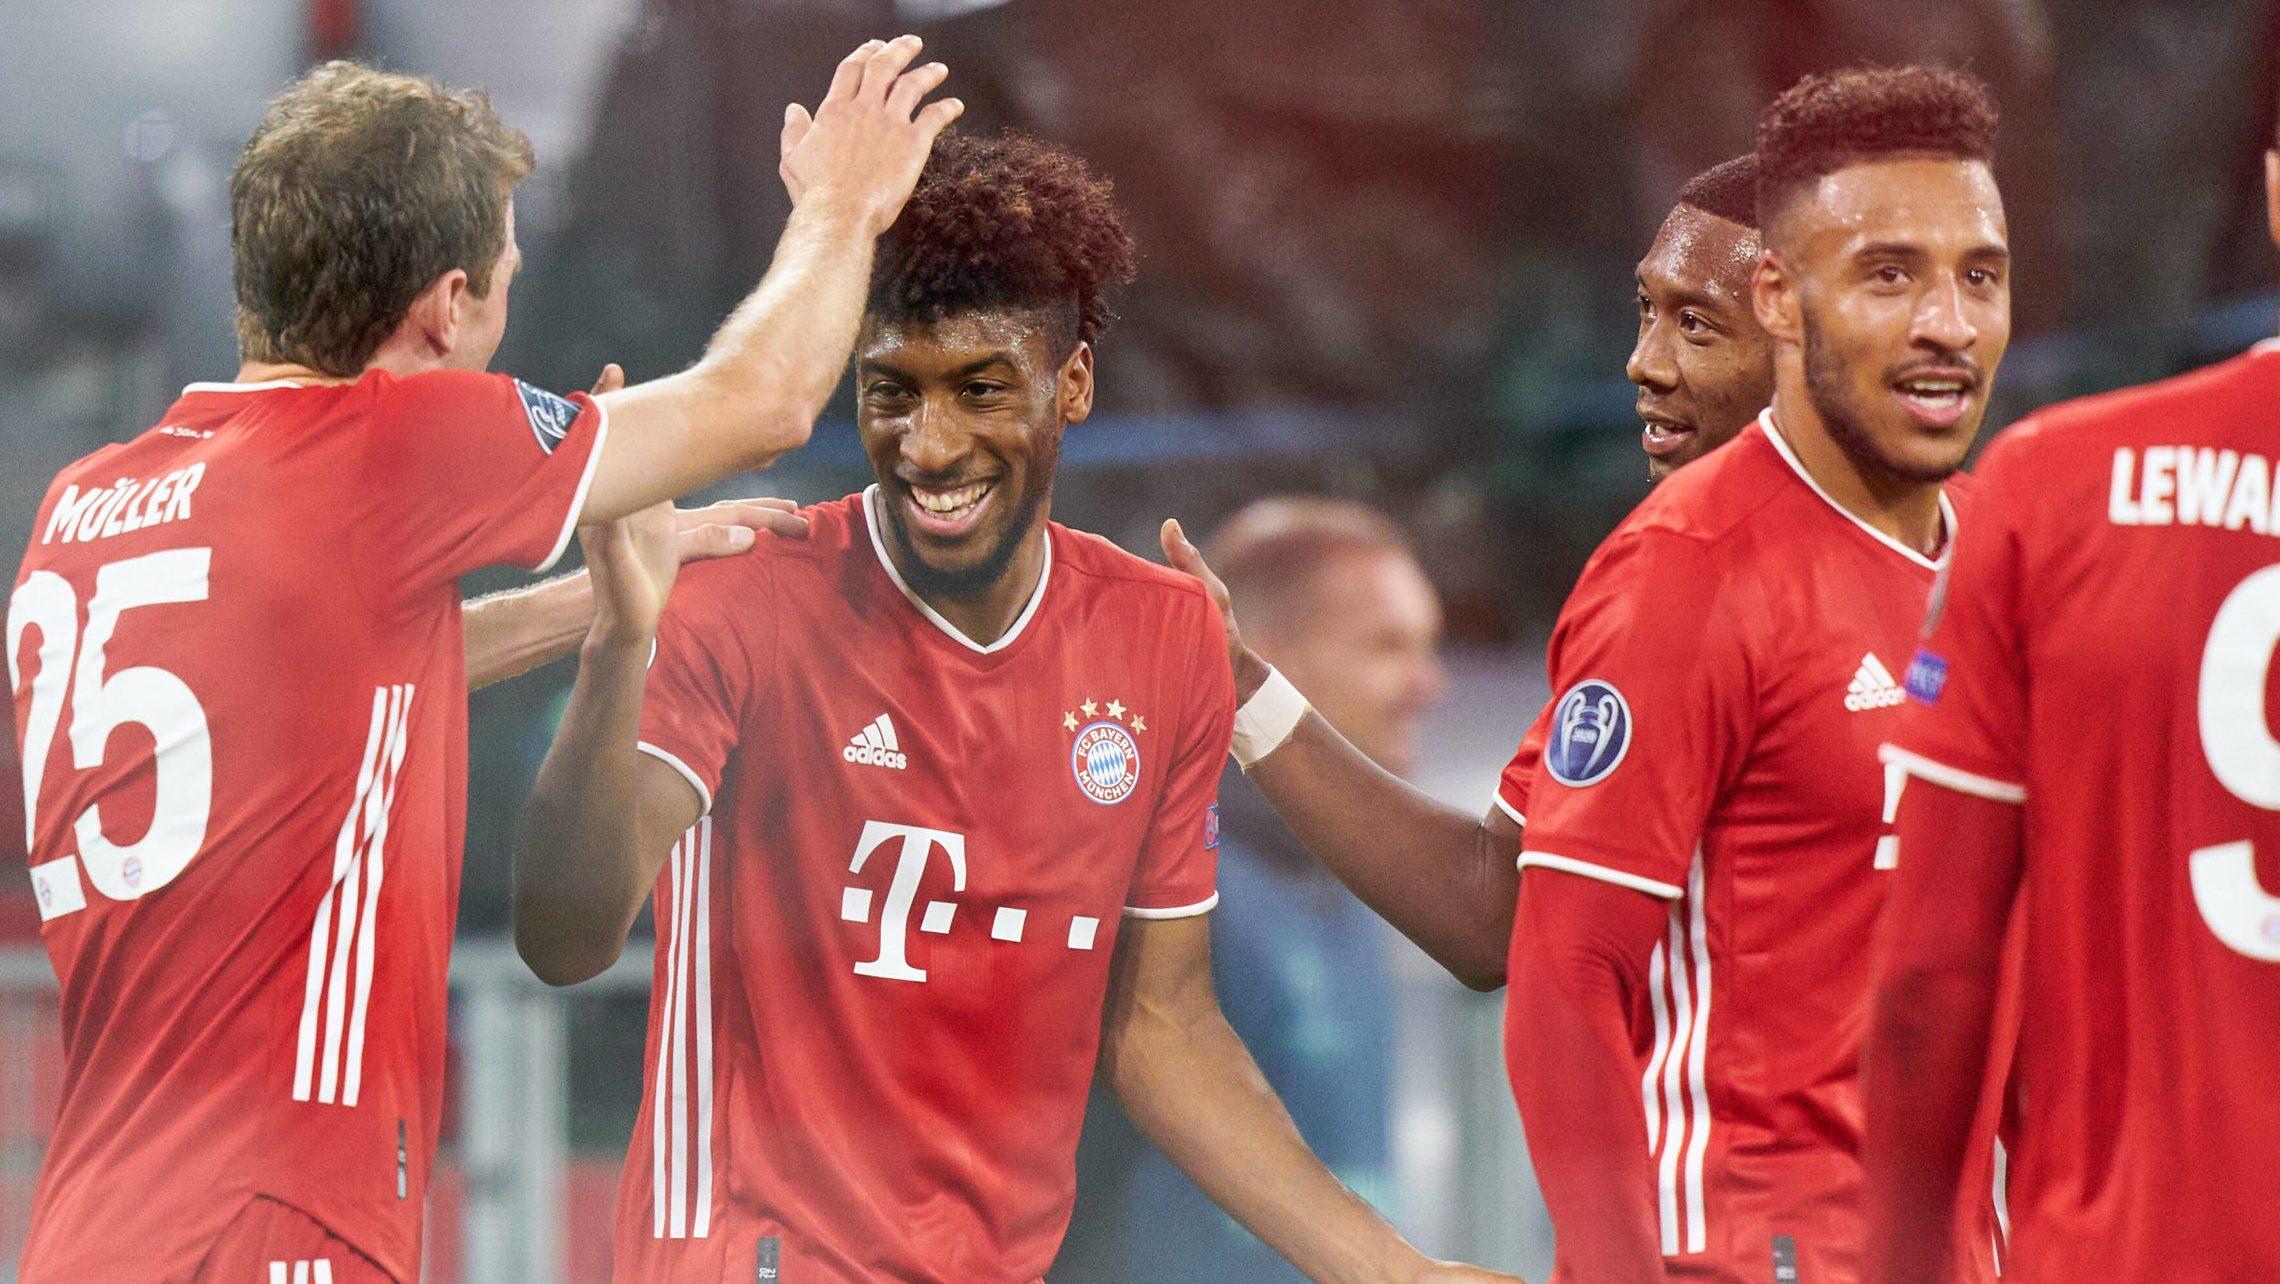 Bundesliga | Kingsley Coman shines as Bayern Munich hammer Atletico Madrid  in UEFA Champions League opener